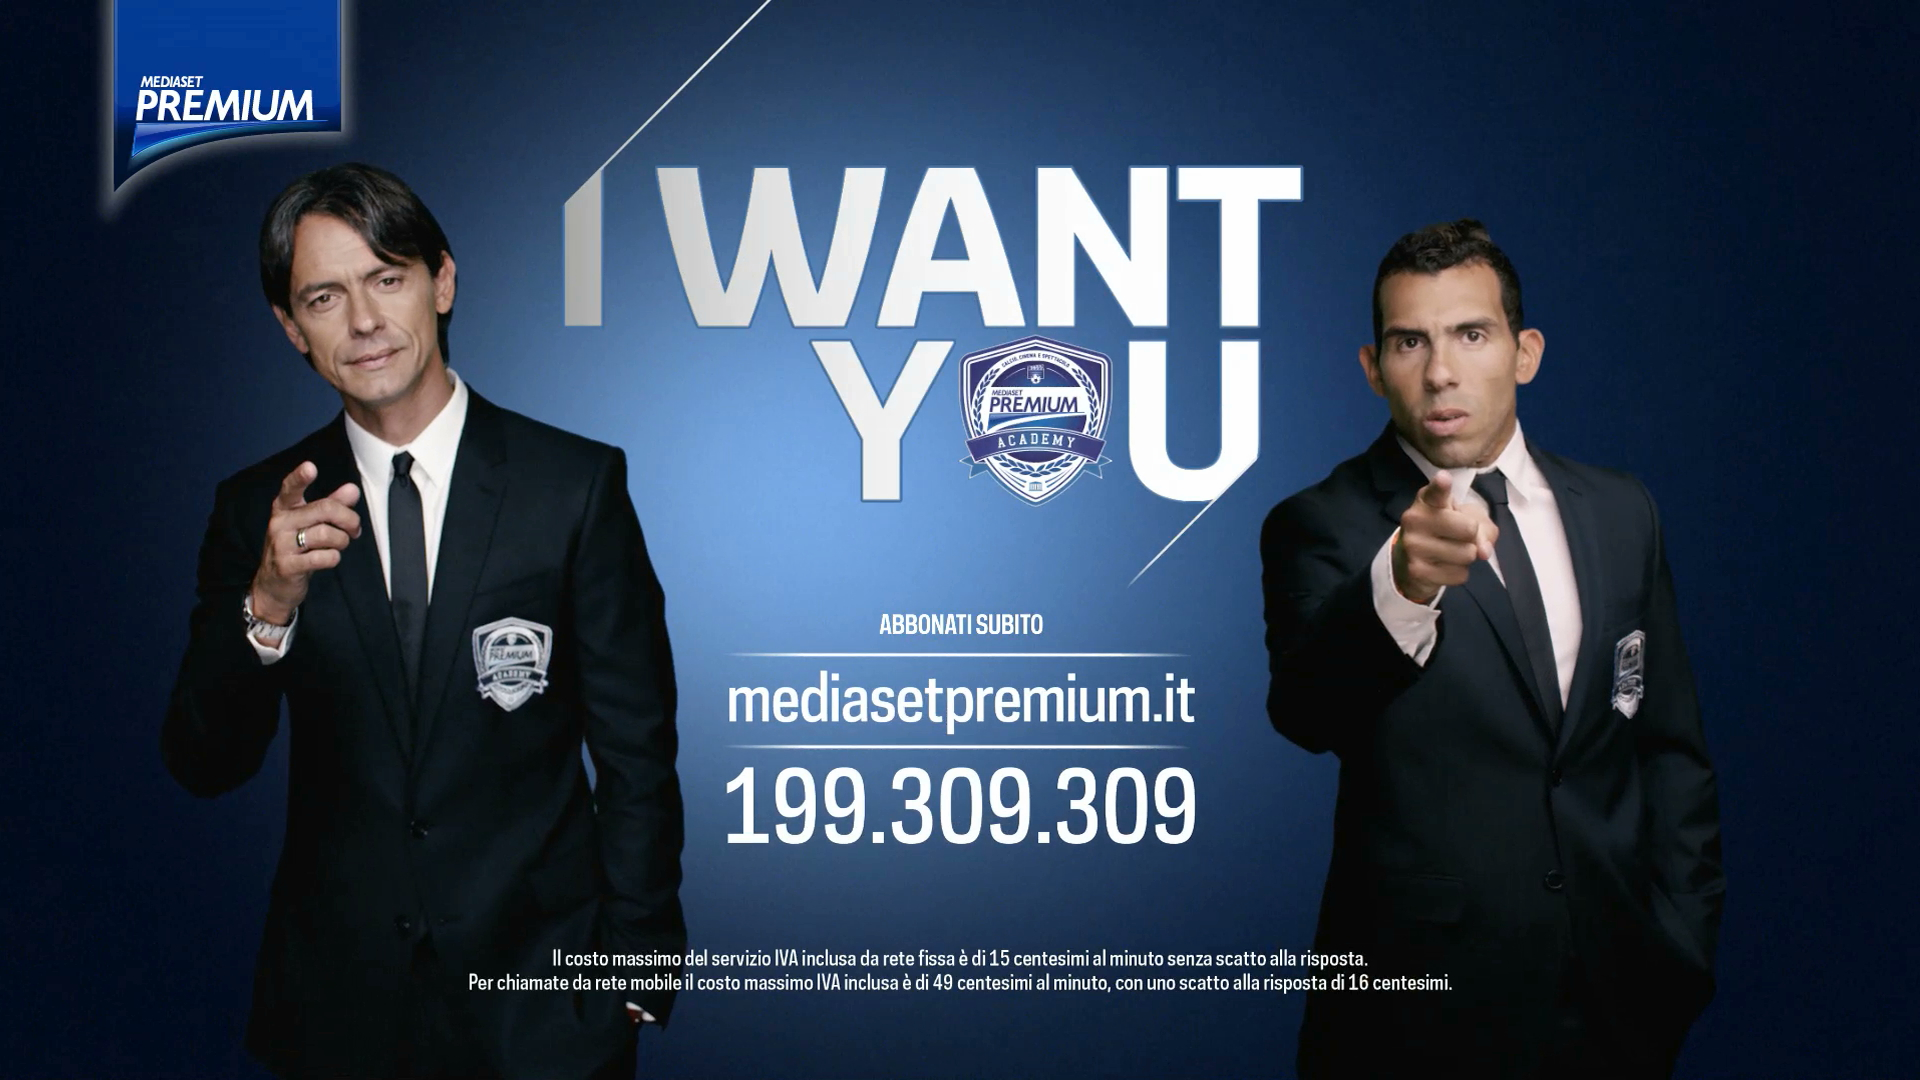 Mediaset Premium: Offerta Calcio, Sport, Serie A ed Europa League a 19,90 per 6 mesi